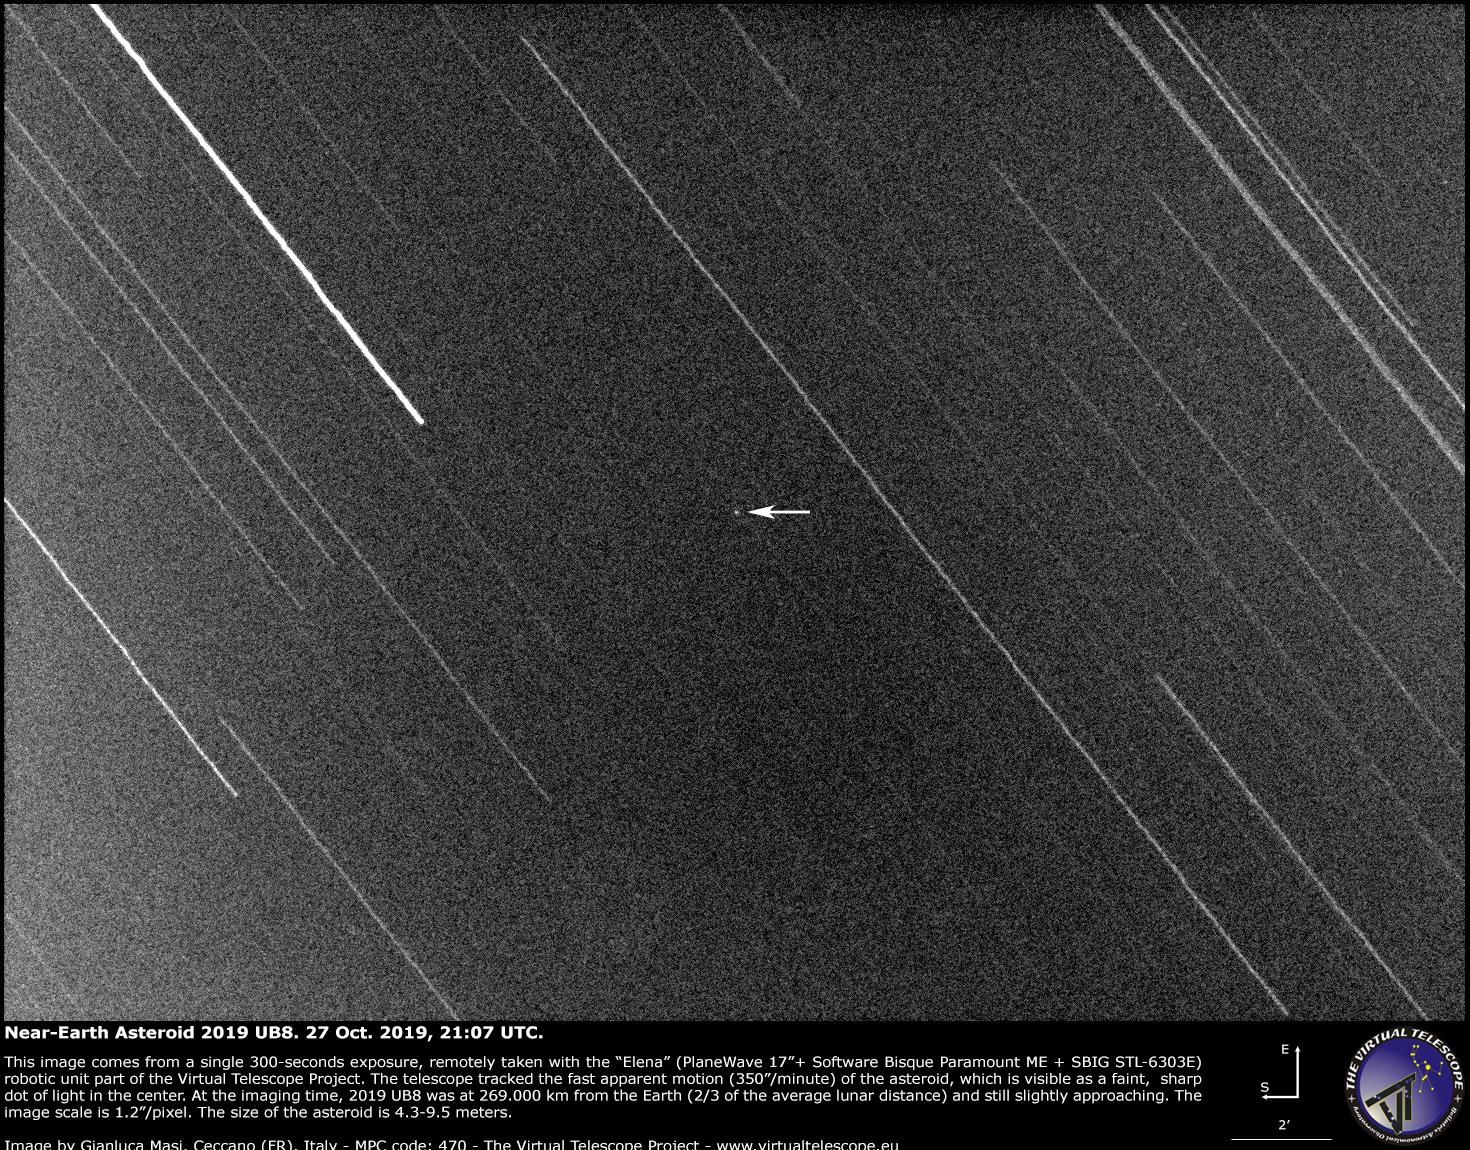 Near-Earth Asteroid 2019 UB8 very close encounter: an image (29 Oct. 2019)